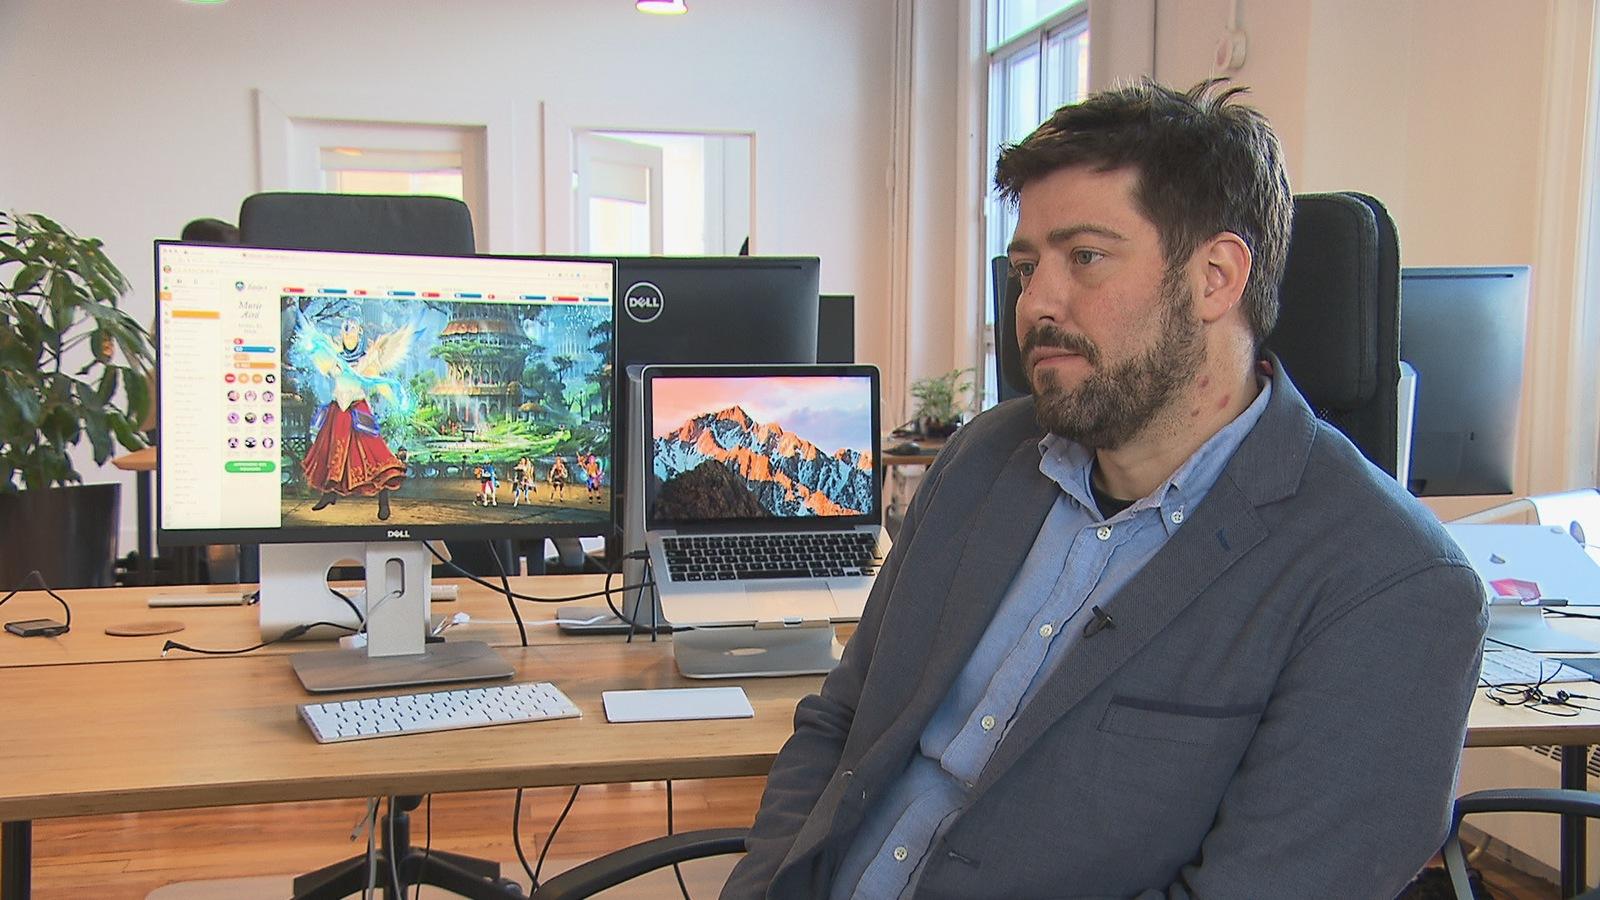 L'un des cofondateurs de Classcraft, Shawn Young